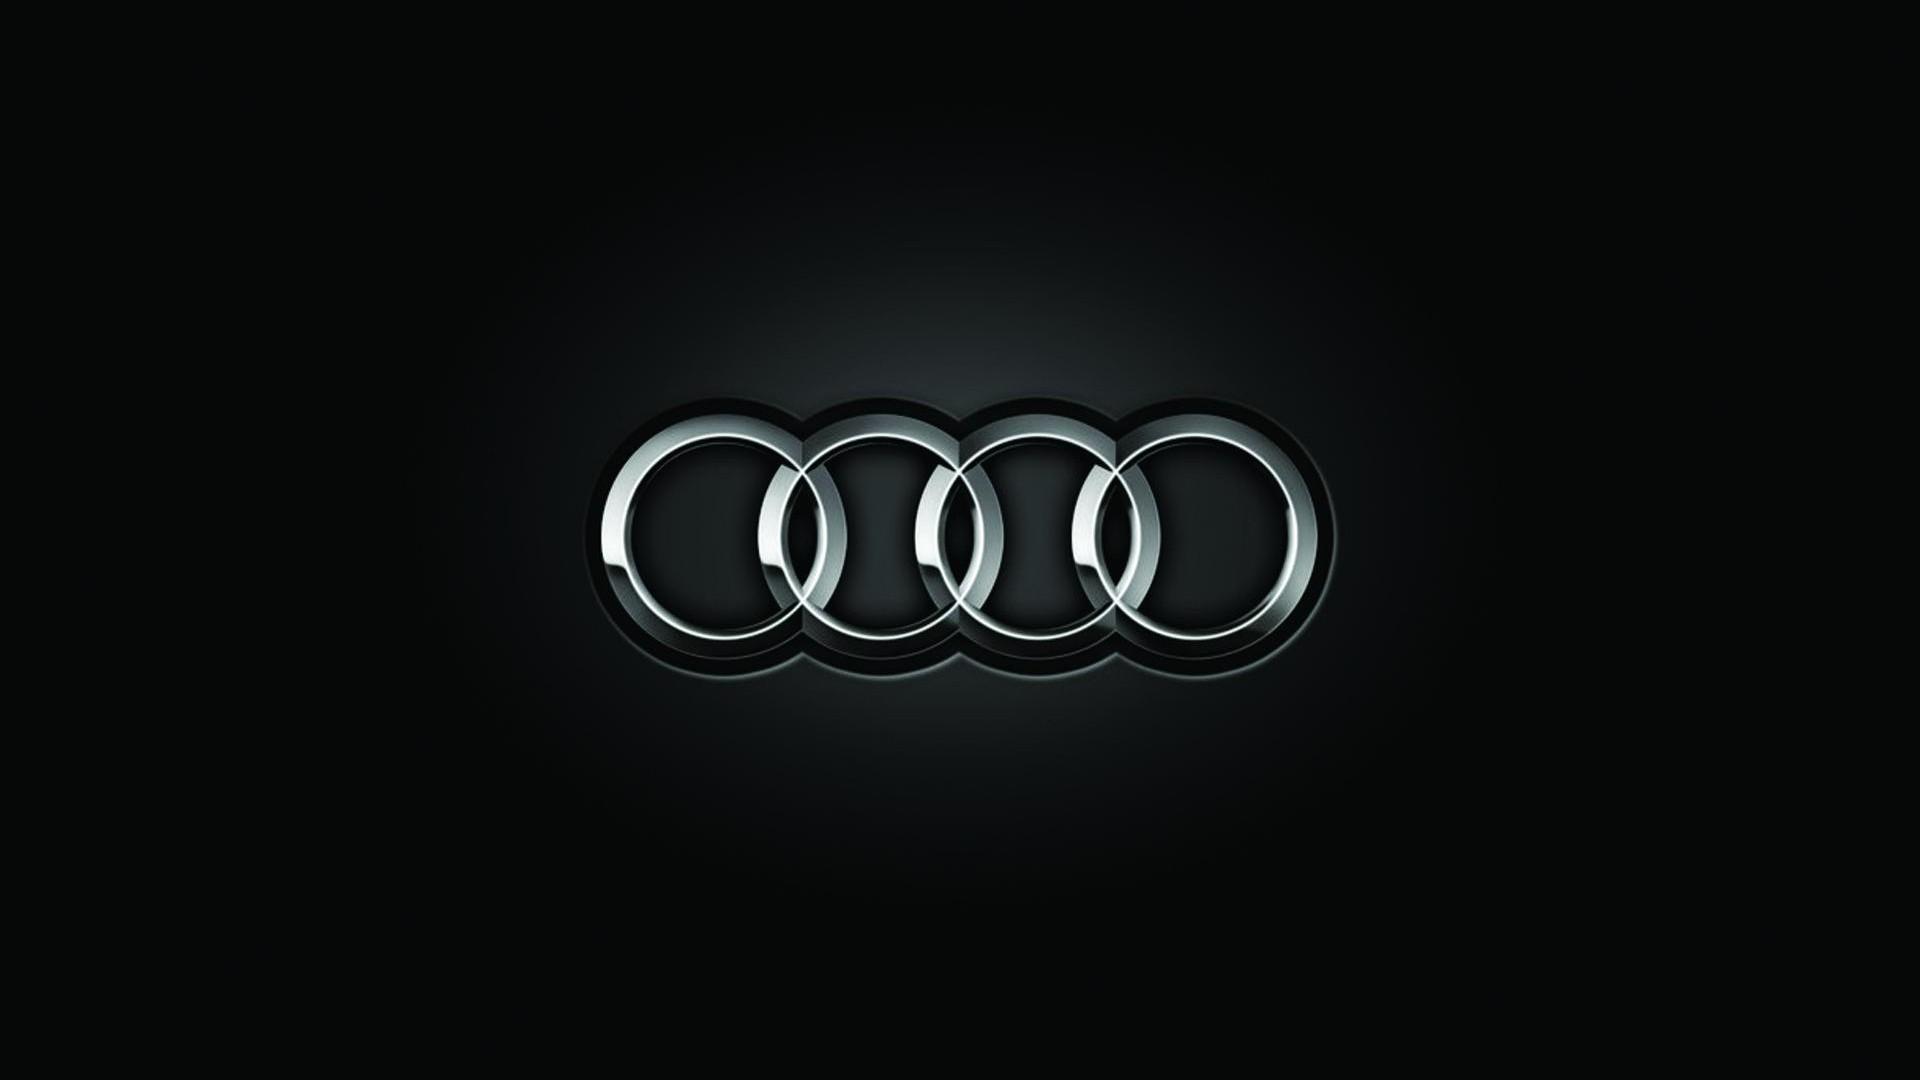 Audi Rings Vehiclesjpg